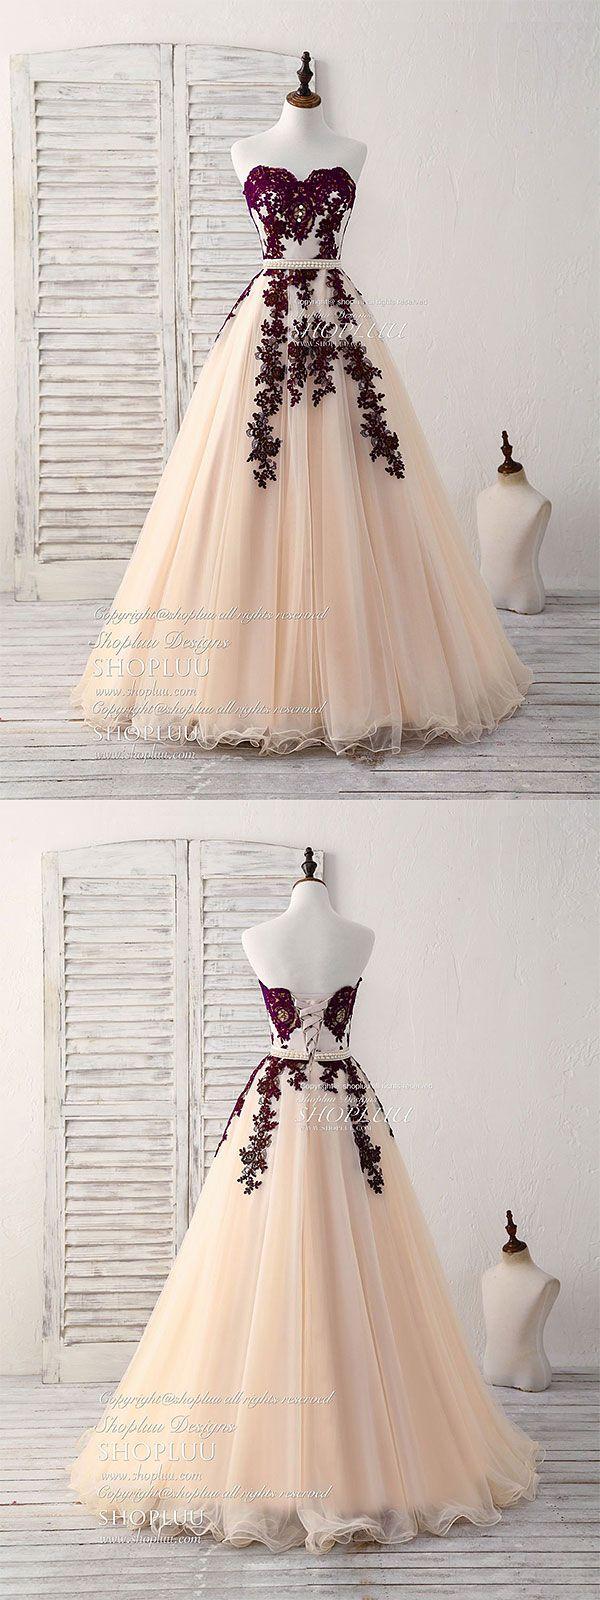 best pageant dresses images on pinterest prom dresses